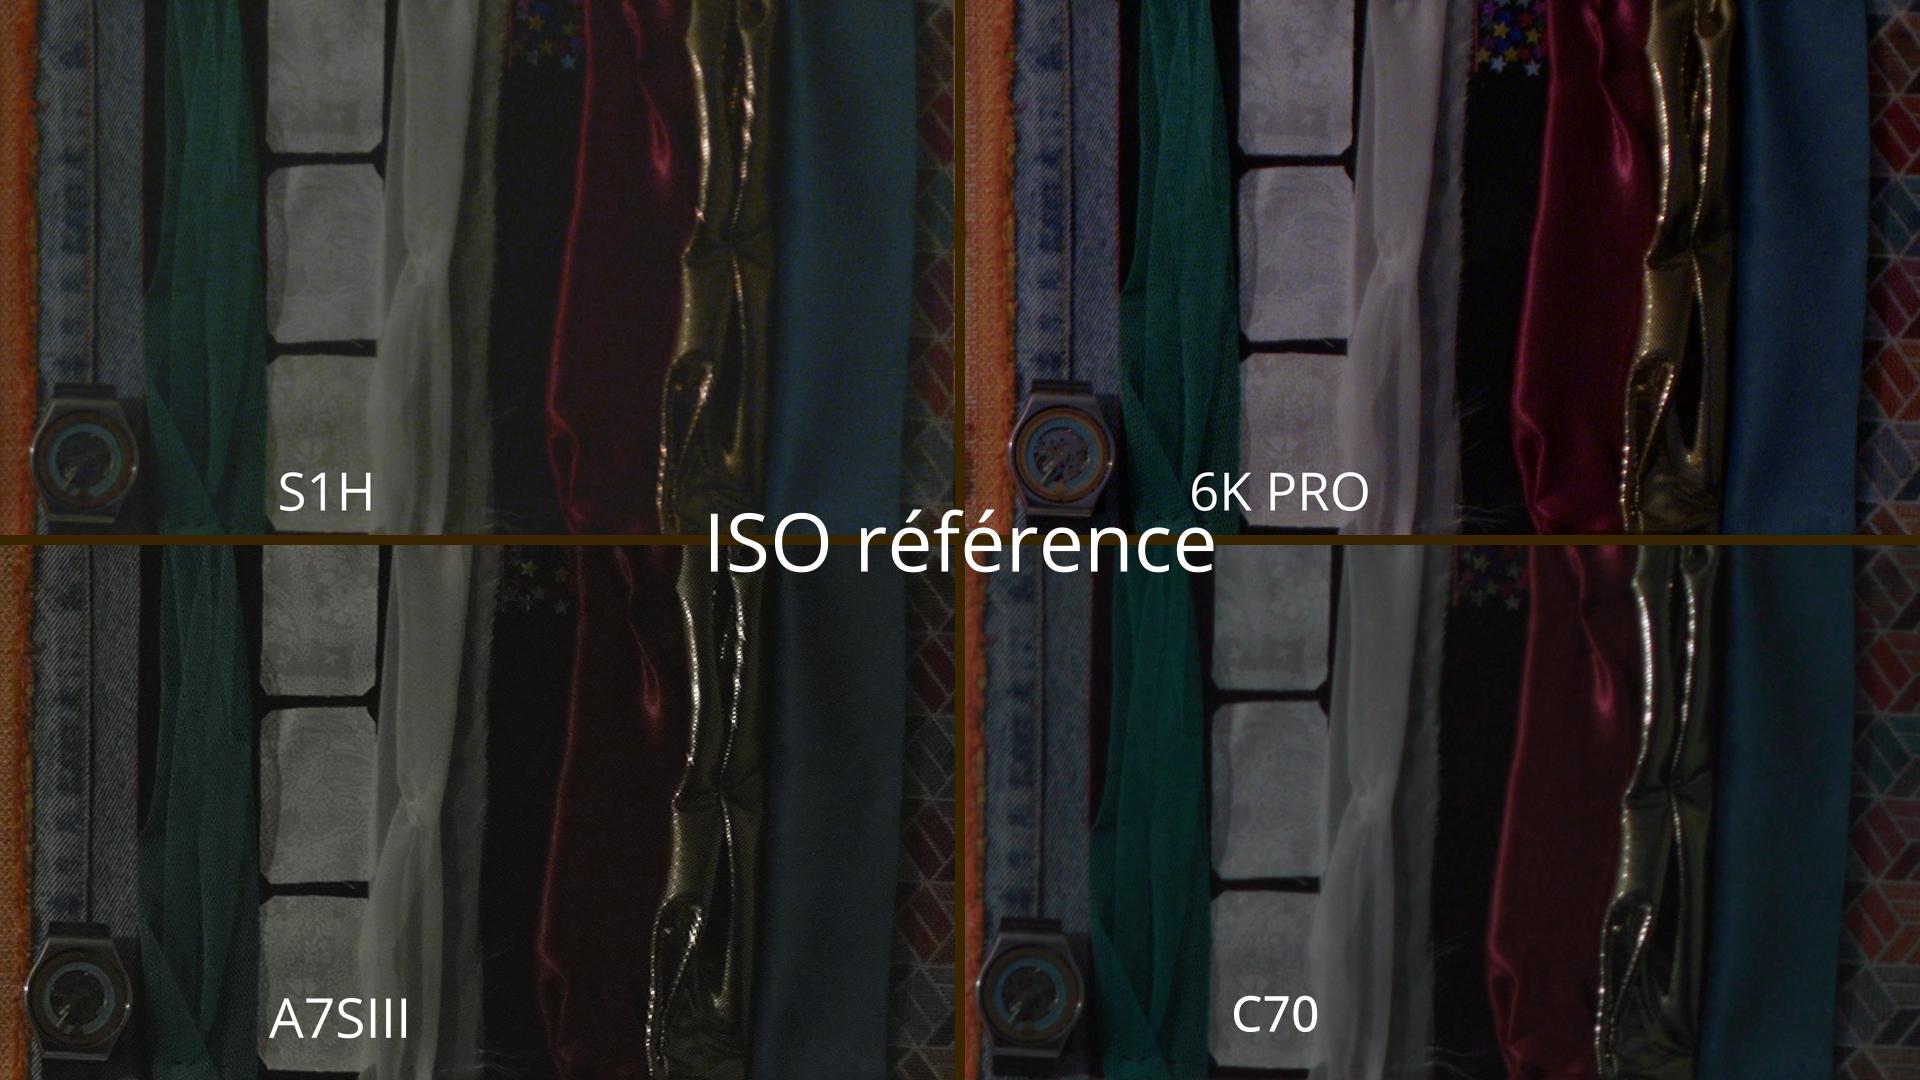 6K PRO tissus comp ref LL_1.17.1_4.21.1.jpg